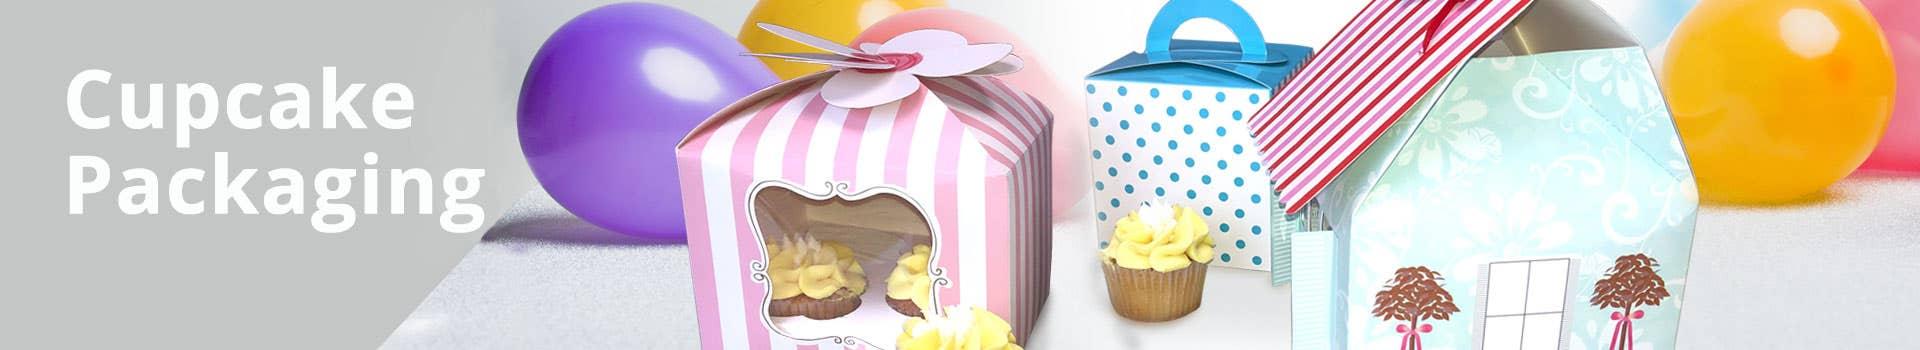 Paper Cupcake Packaging